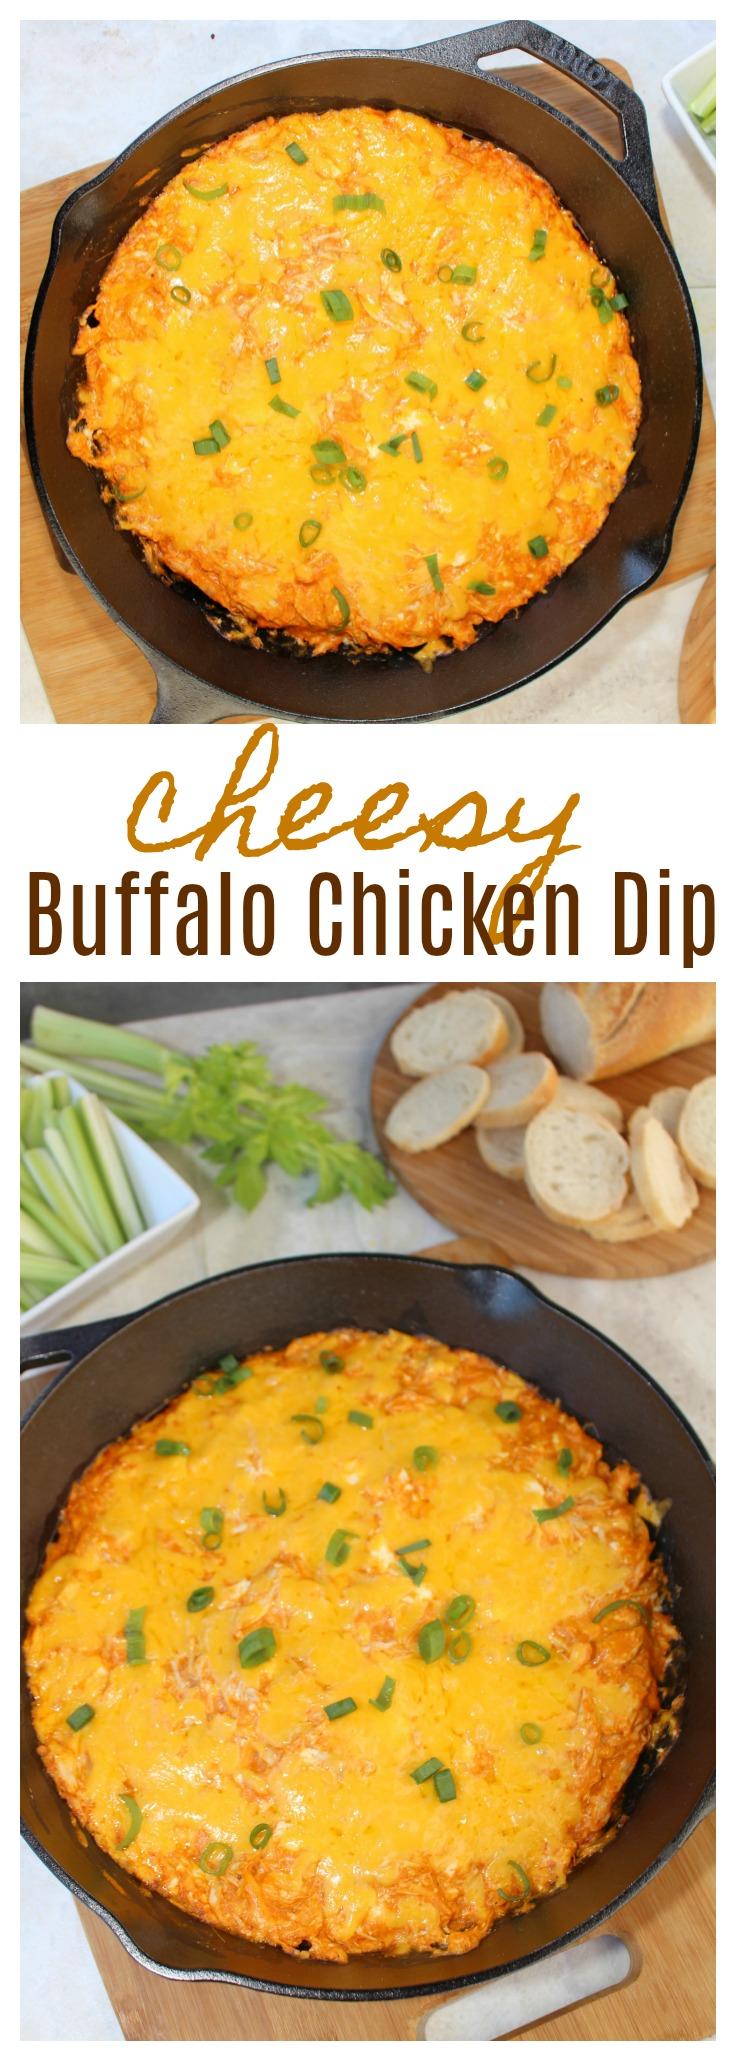 Cheesy Buffalo Chicken Dip